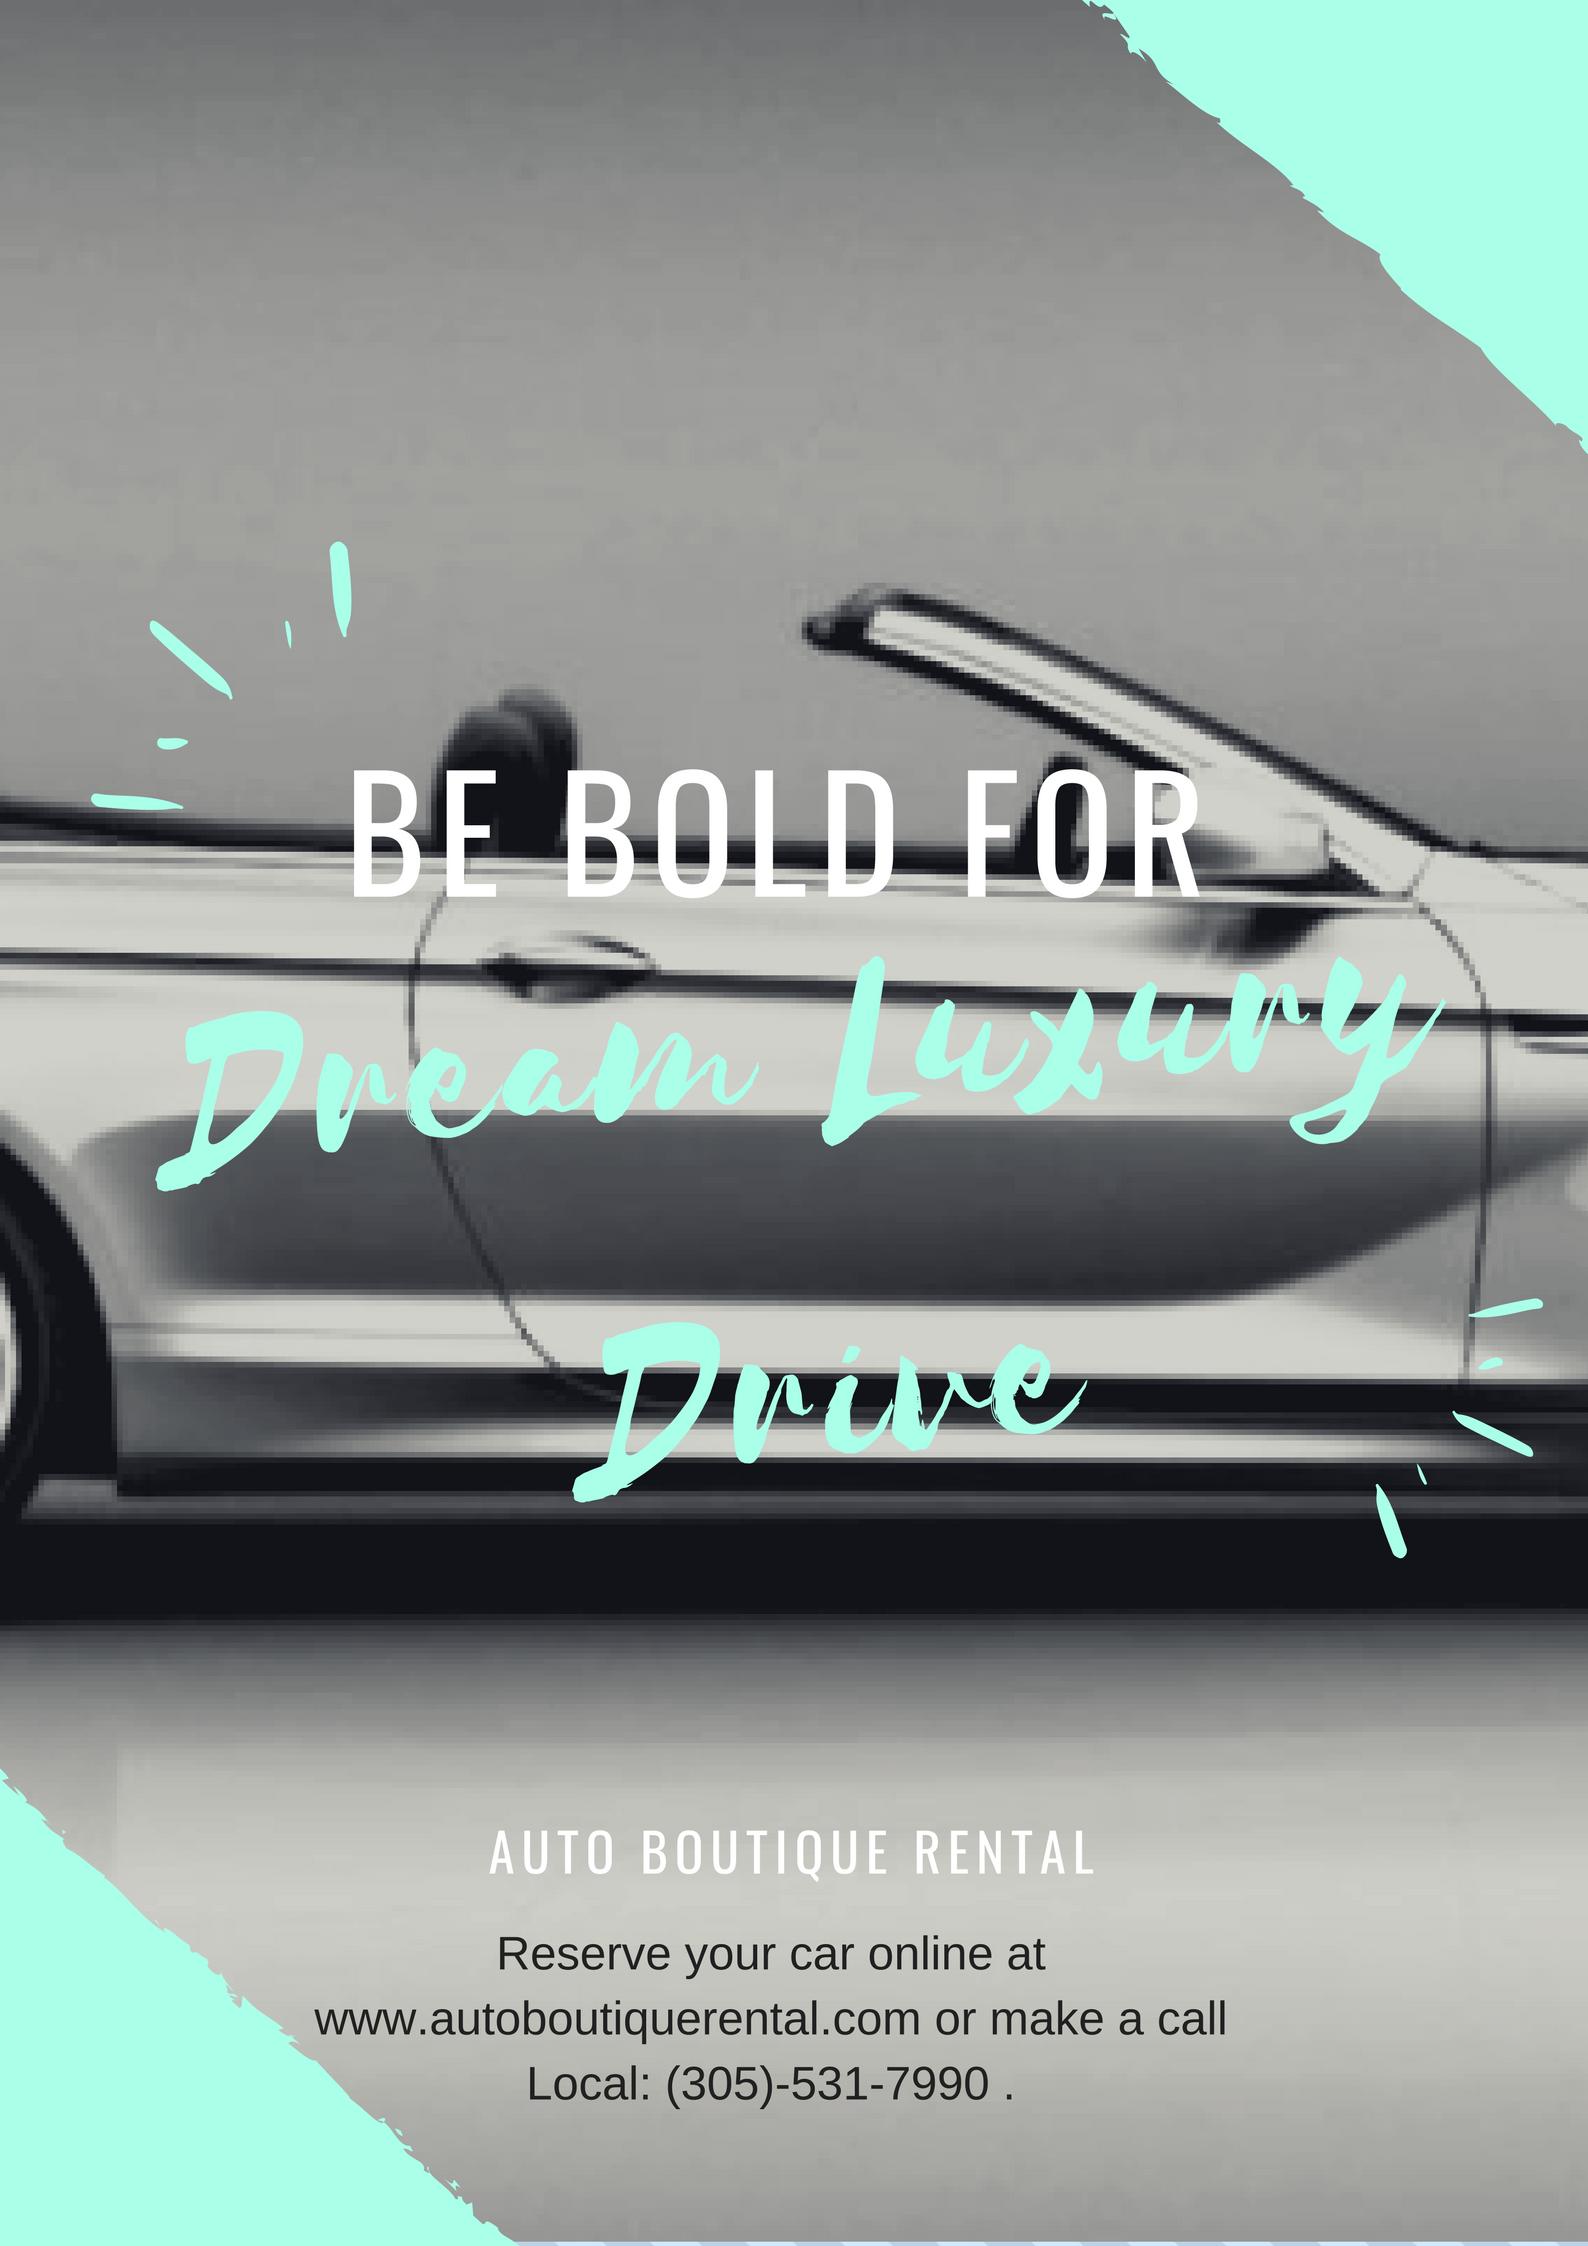 Auto Boutique Rental A Luxury Exotic Car Rental Services In Miami